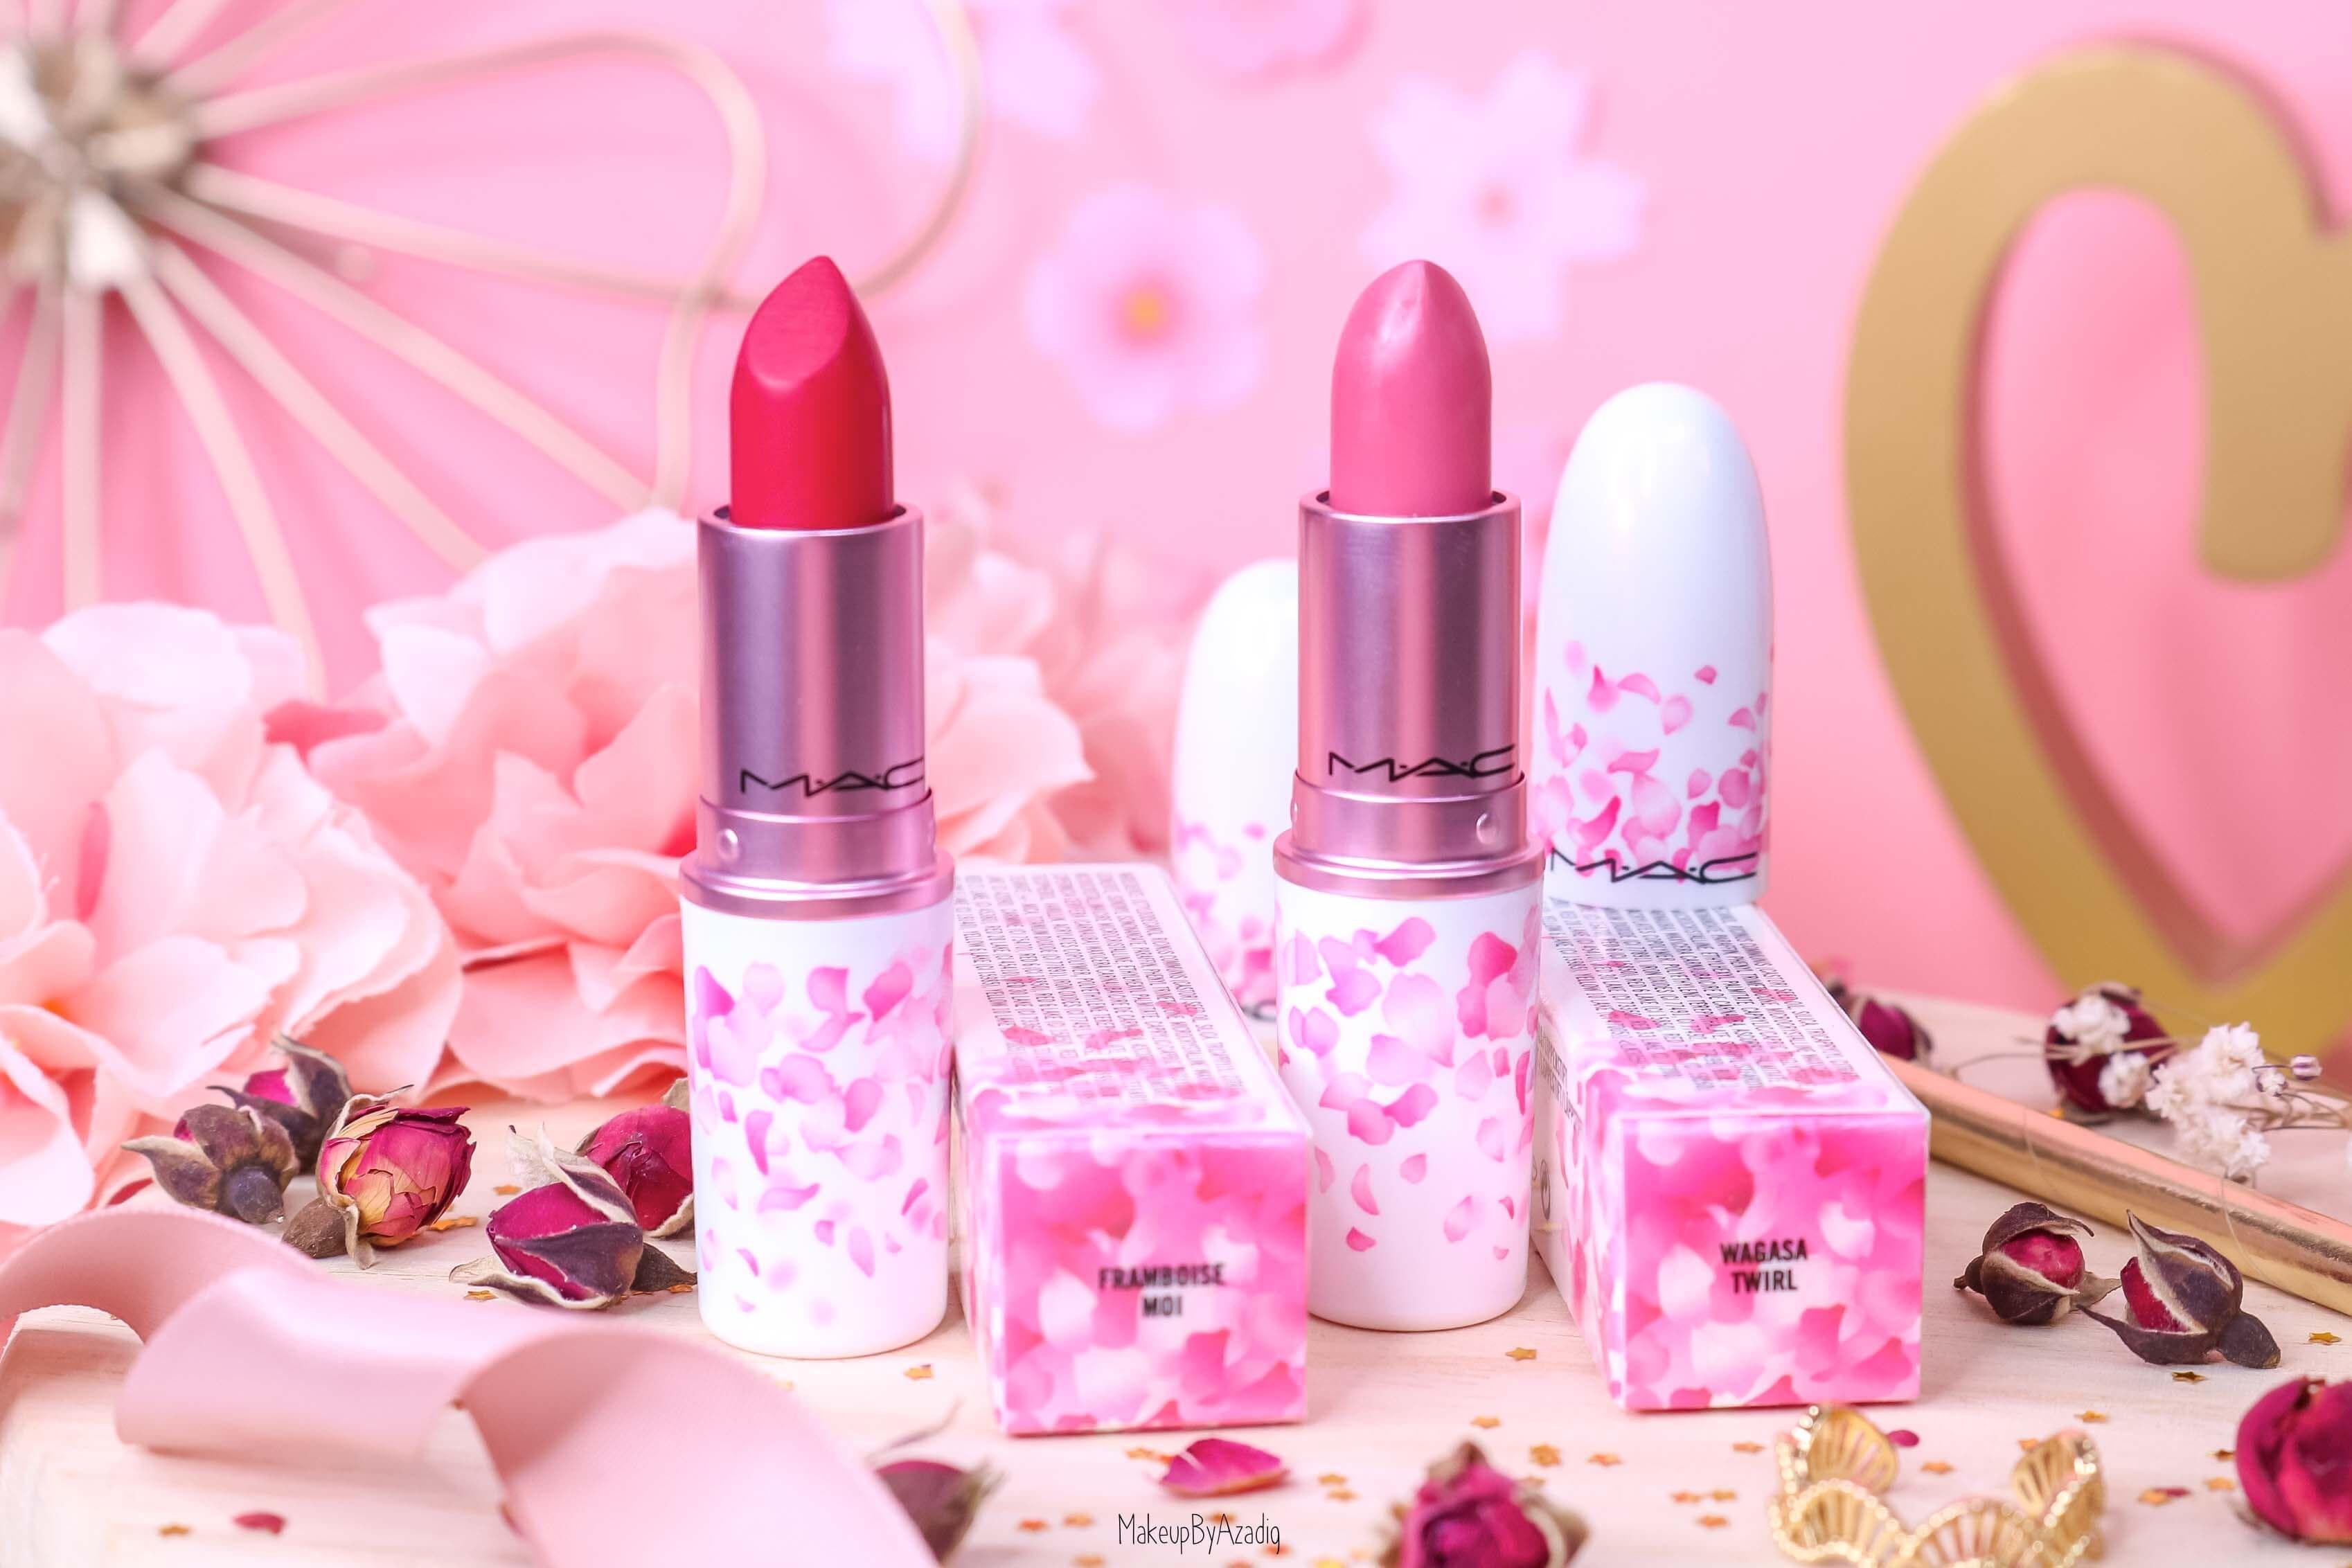 revue-rouge-a-levres-mac-cosmetics-collection-boom-boom-bloom-printemps-makeupbyazadig-avis-swatch-prix-france-miniature